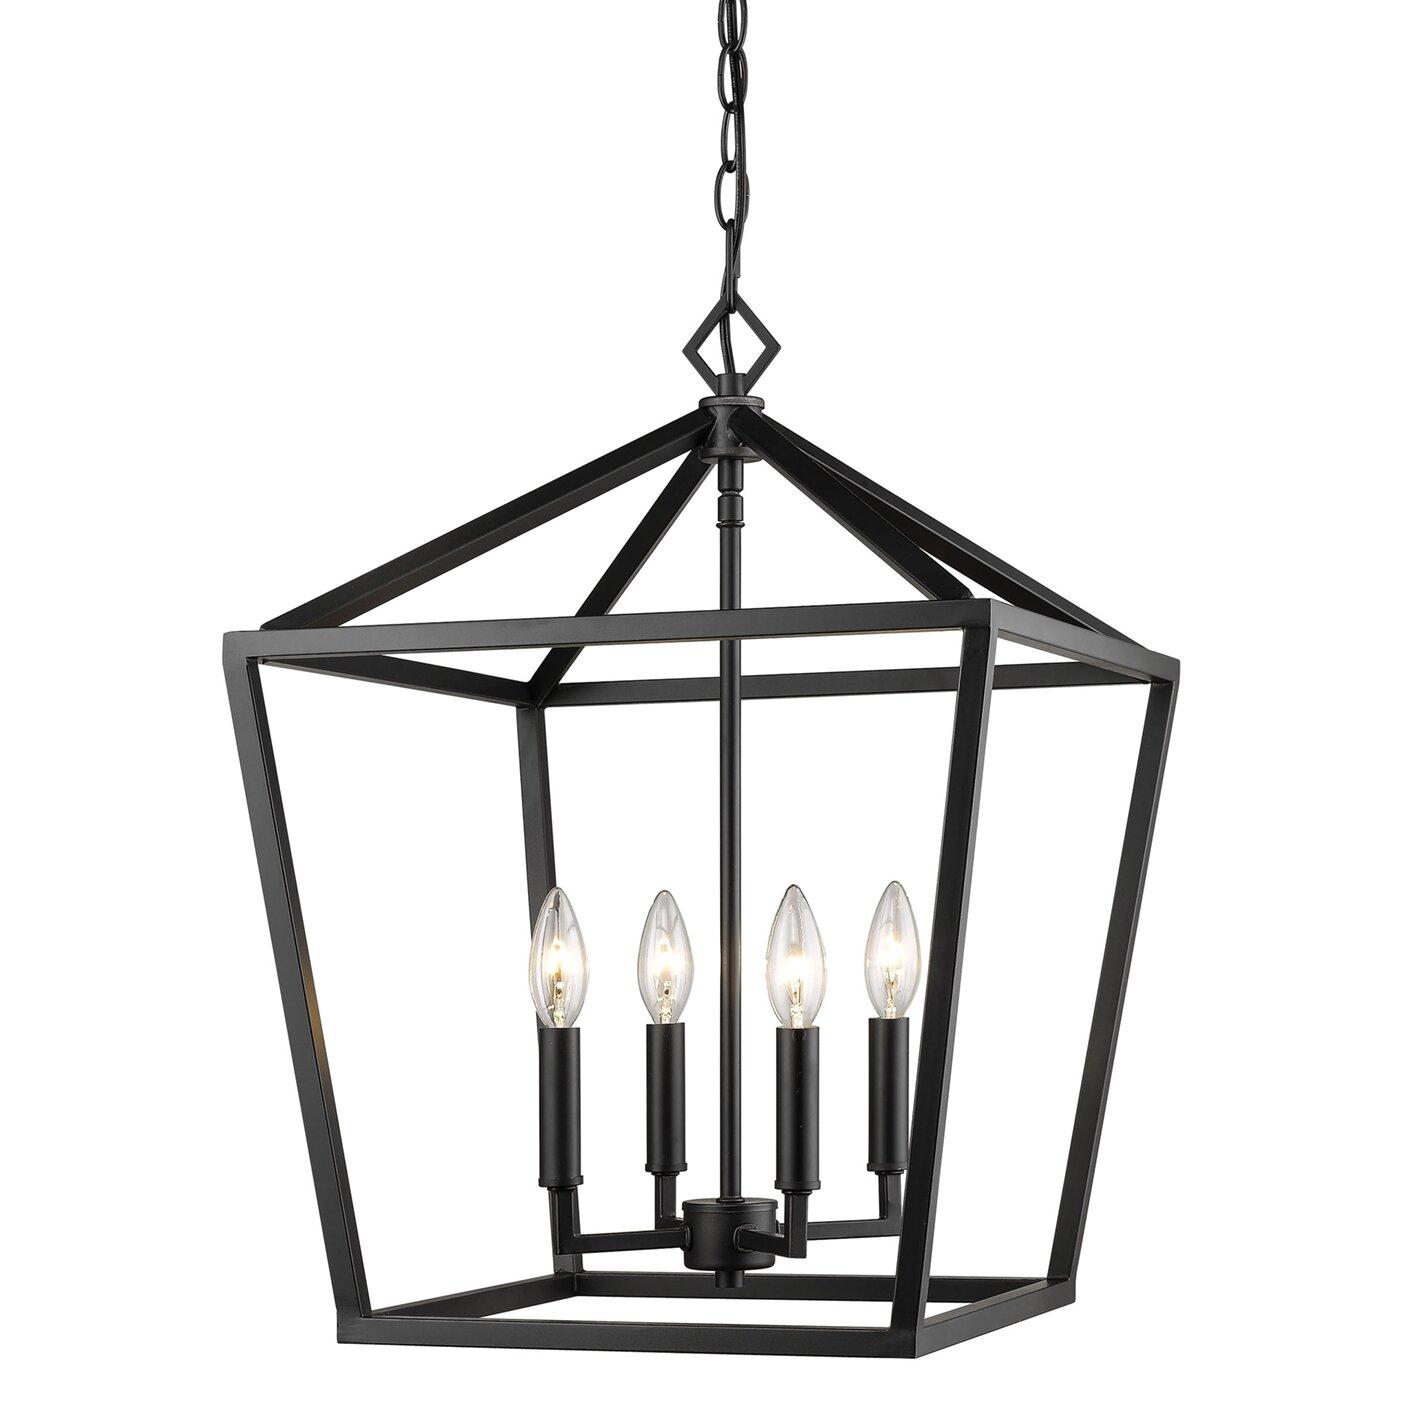 Poisson 4 Light Lantern Chandelier